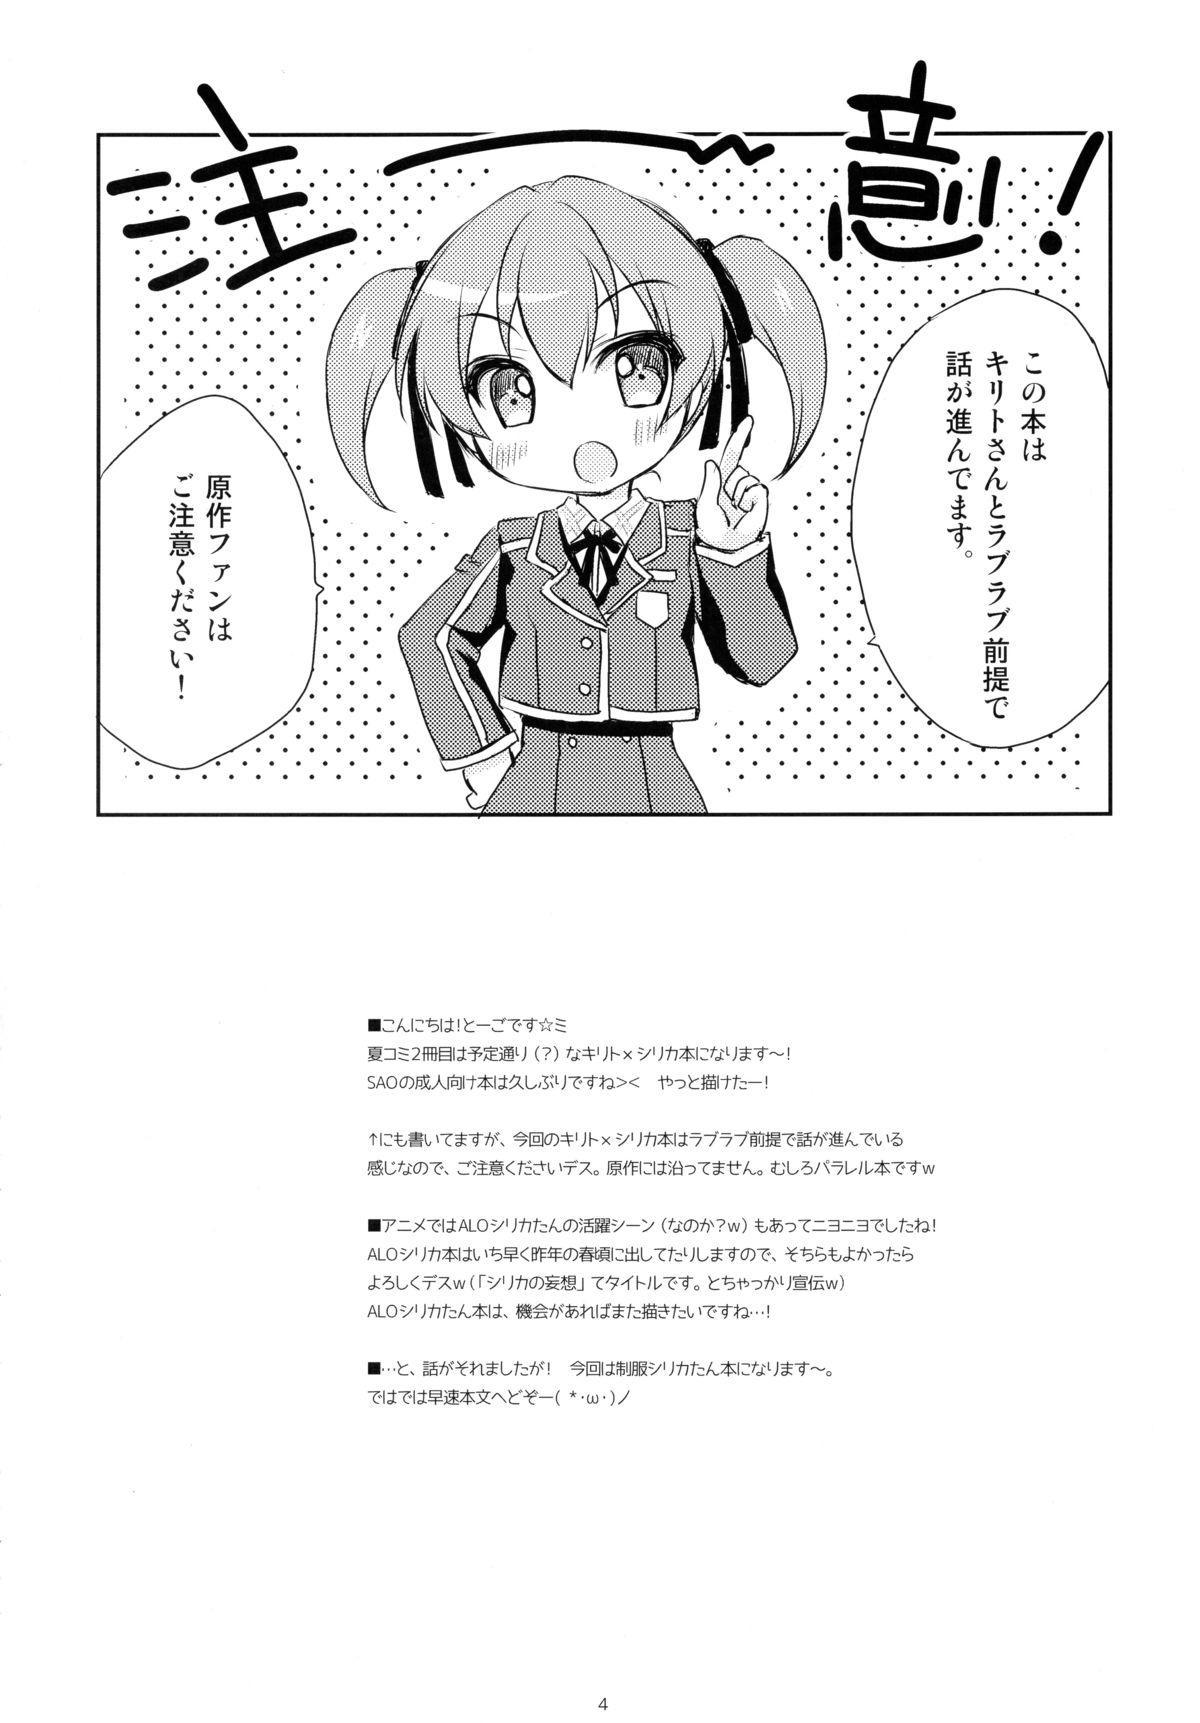 Itazura Silica-chan 3